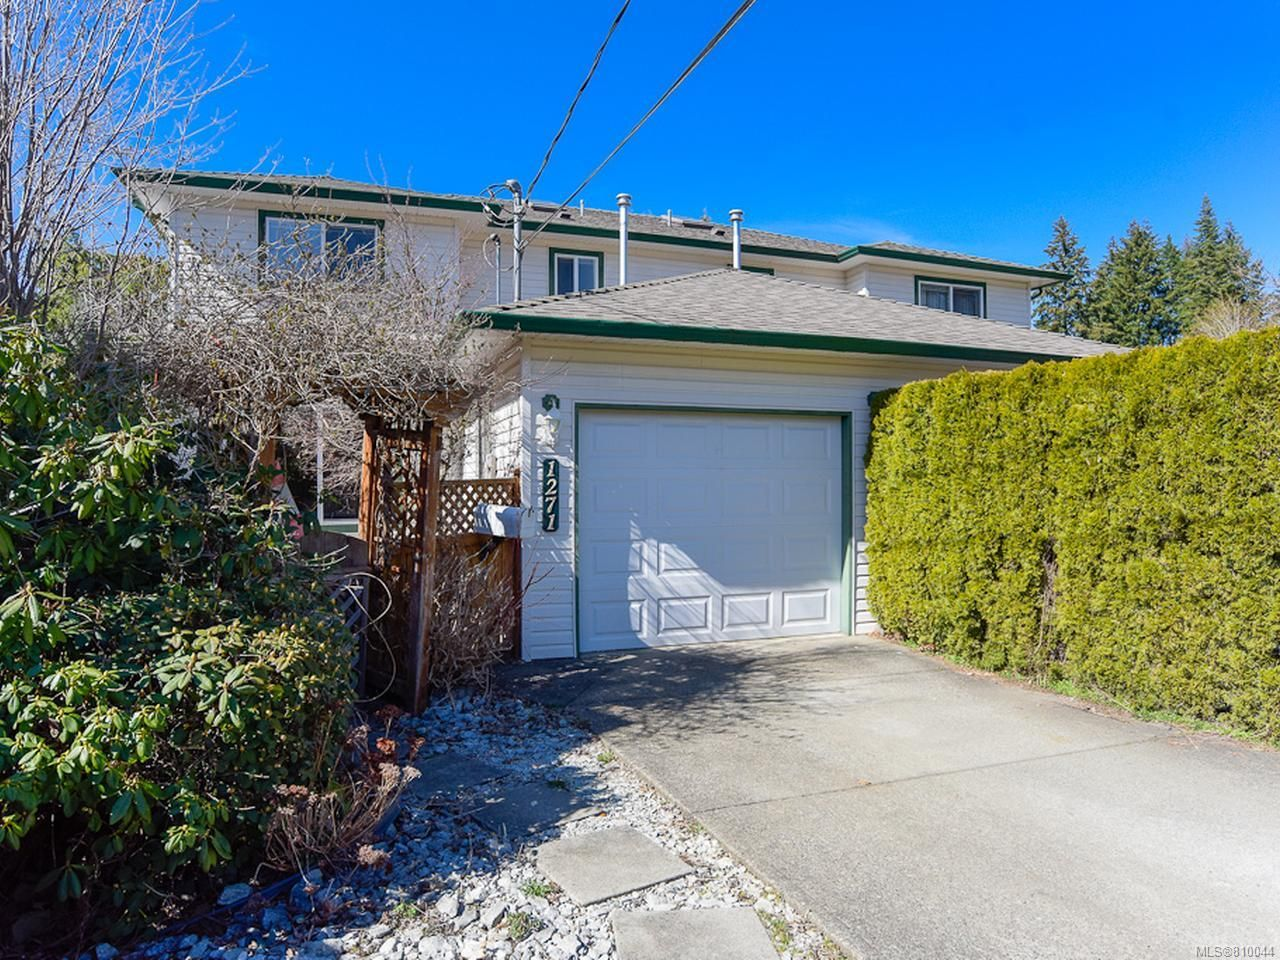 Main Photo: A 1271 MARTIN PLACE in COURTENAY: CV Courtenay City Half Duplex for sale (Comox Valley)  : MLS®# 810044